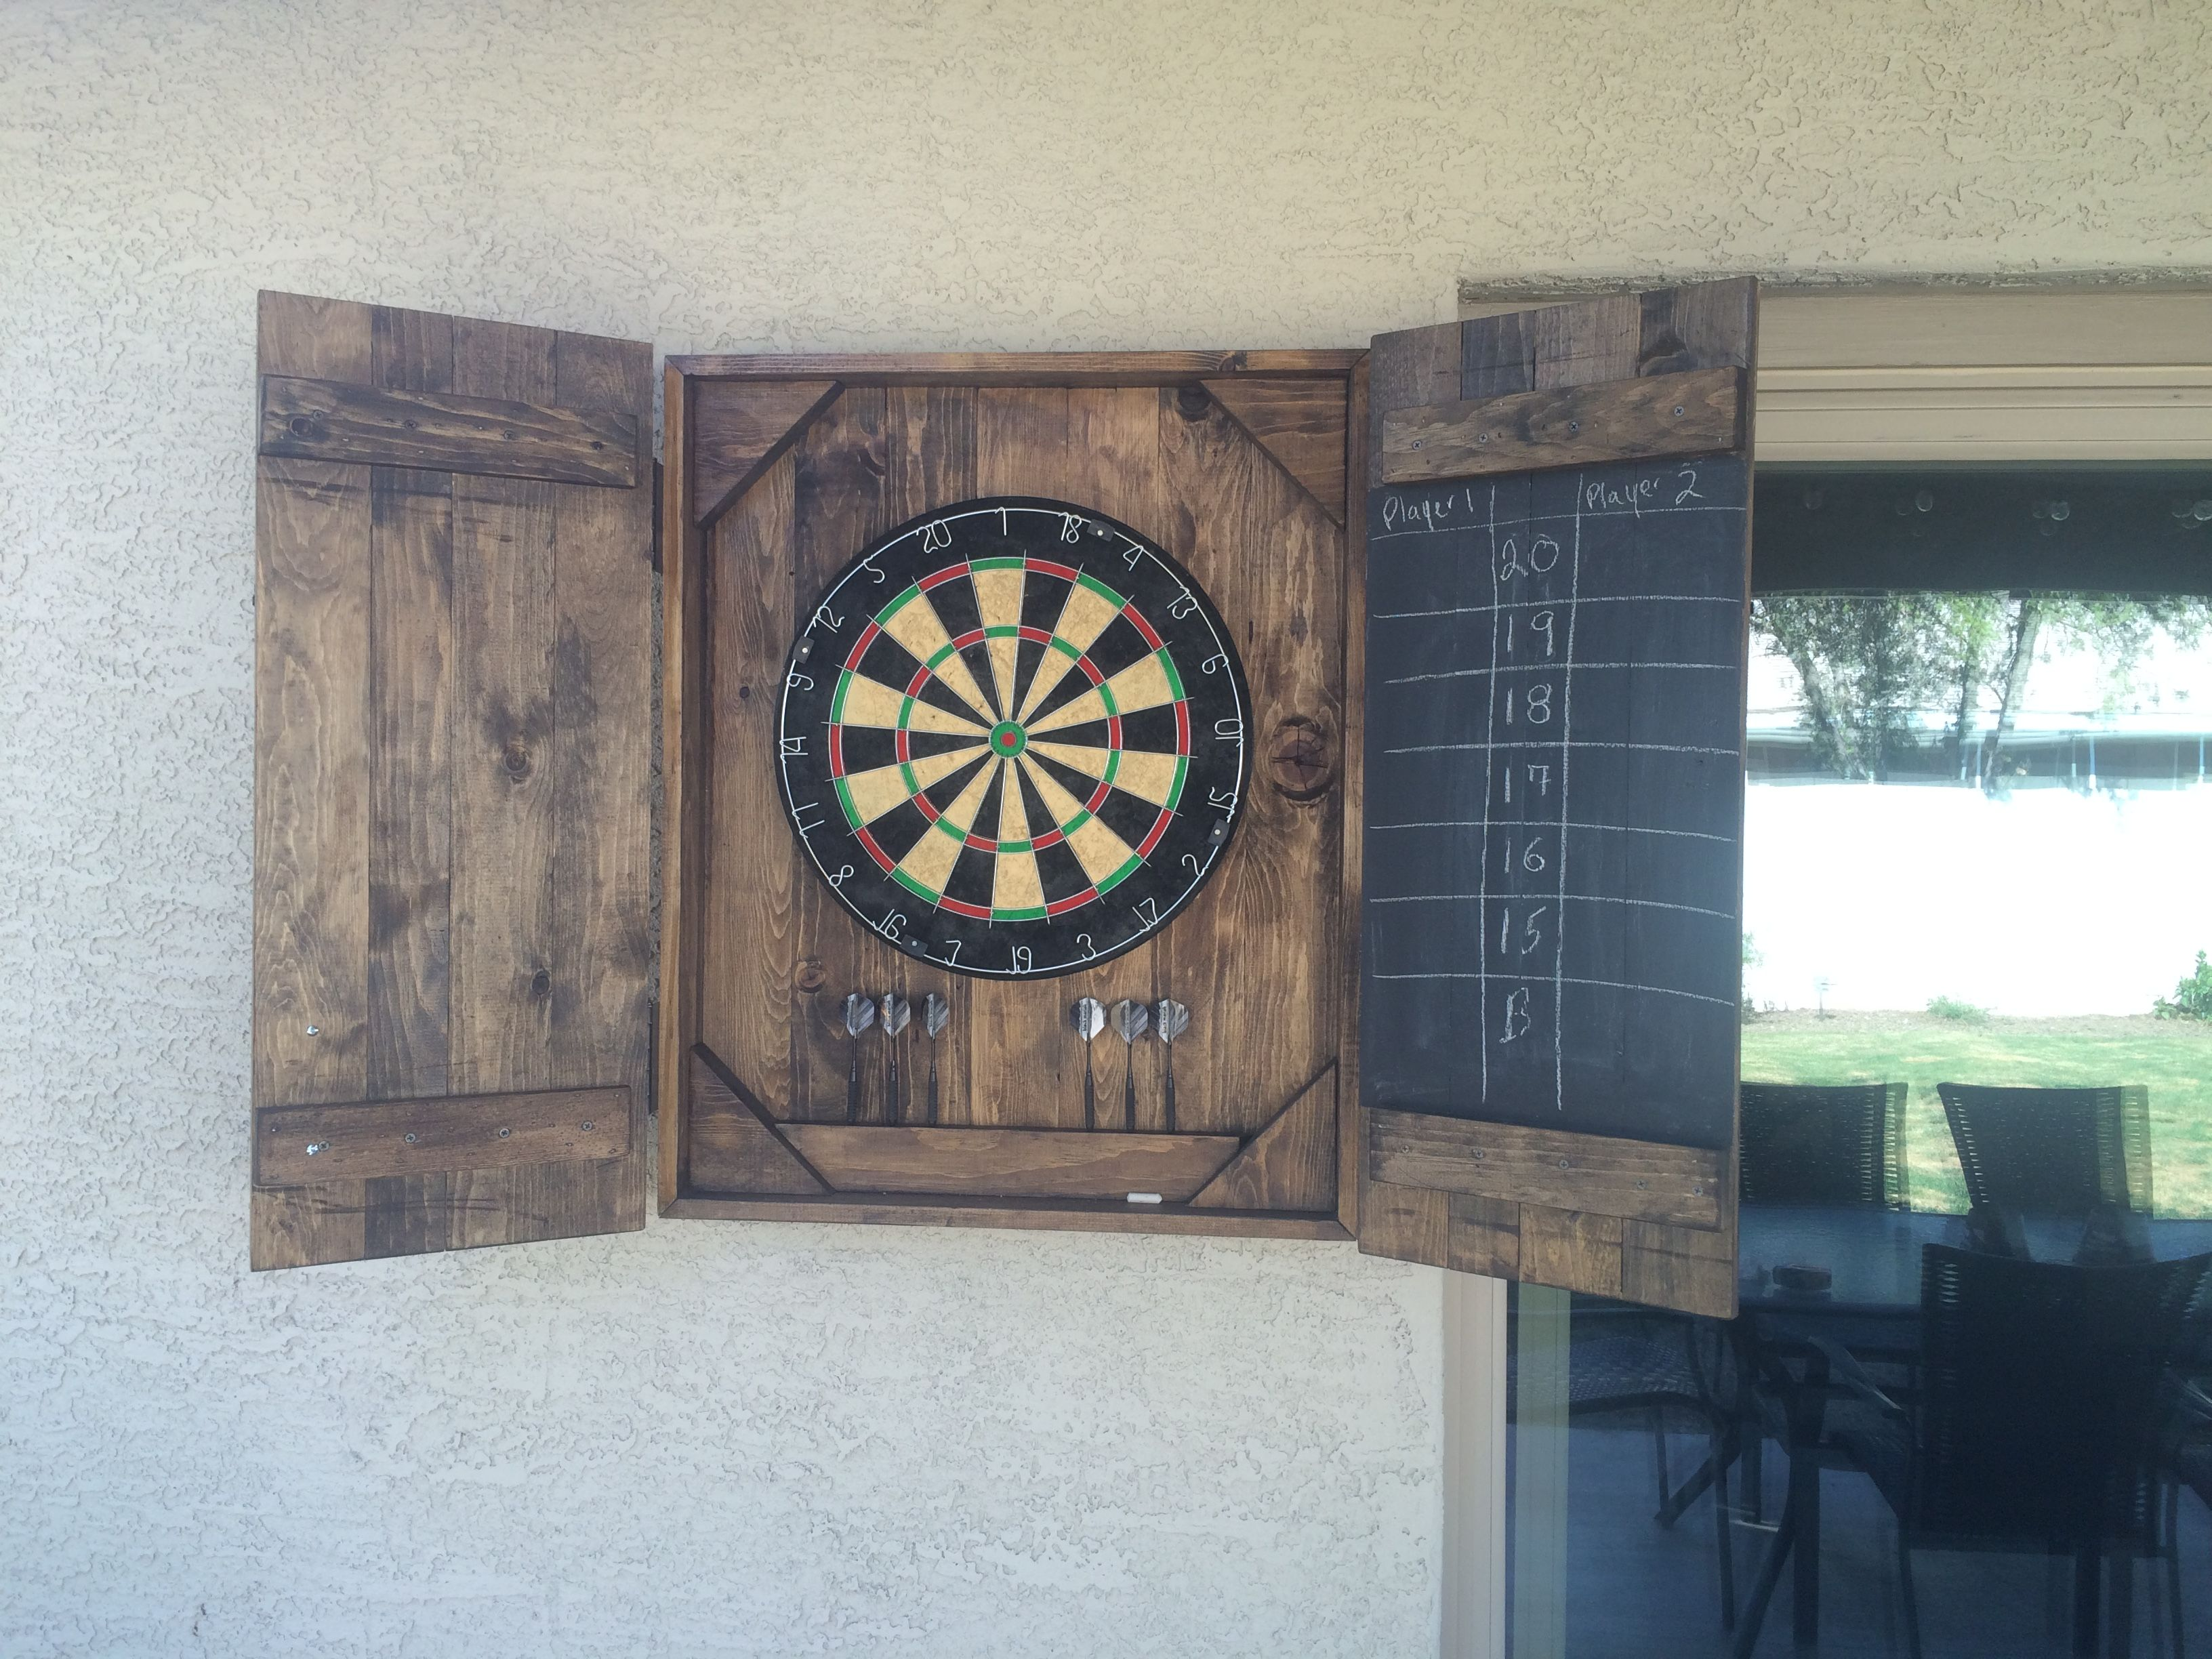 Cool diy dart board case diy decor pinterest dart board cool diy dart board case solutioingenieria Gallery